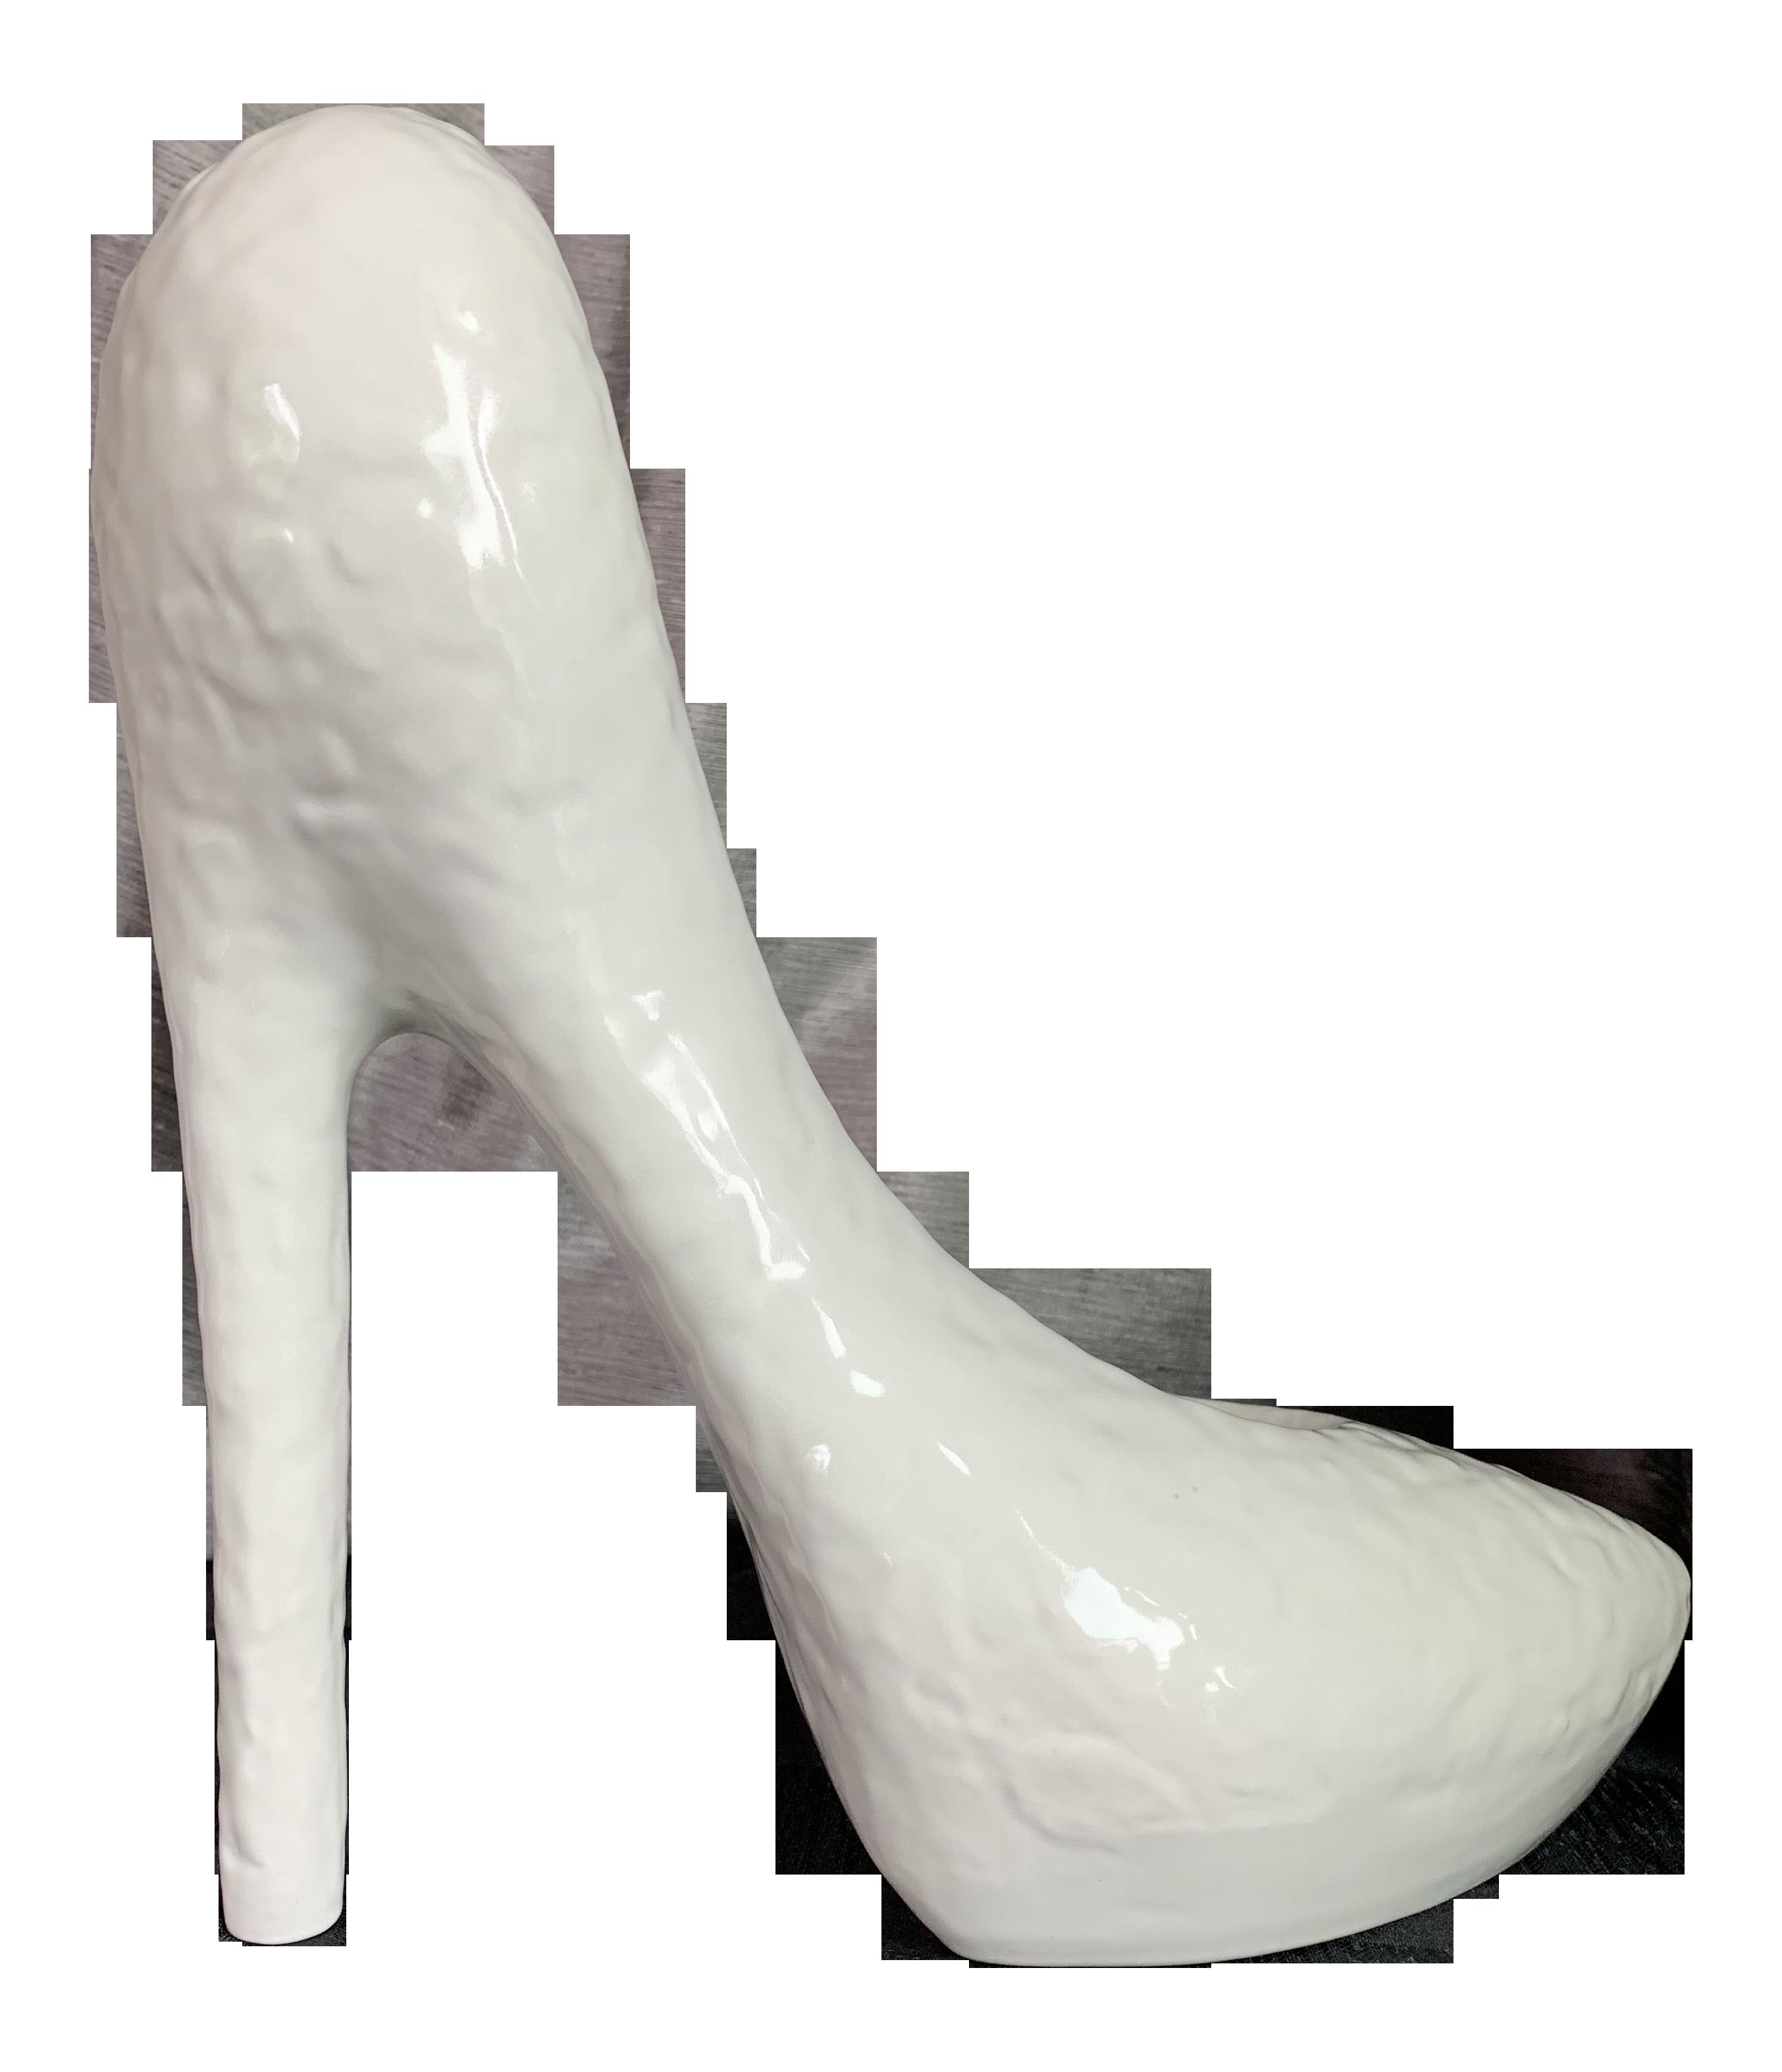 Large Pop Art Inspired High Heel Shoe Ceramic Pottery Sculpture